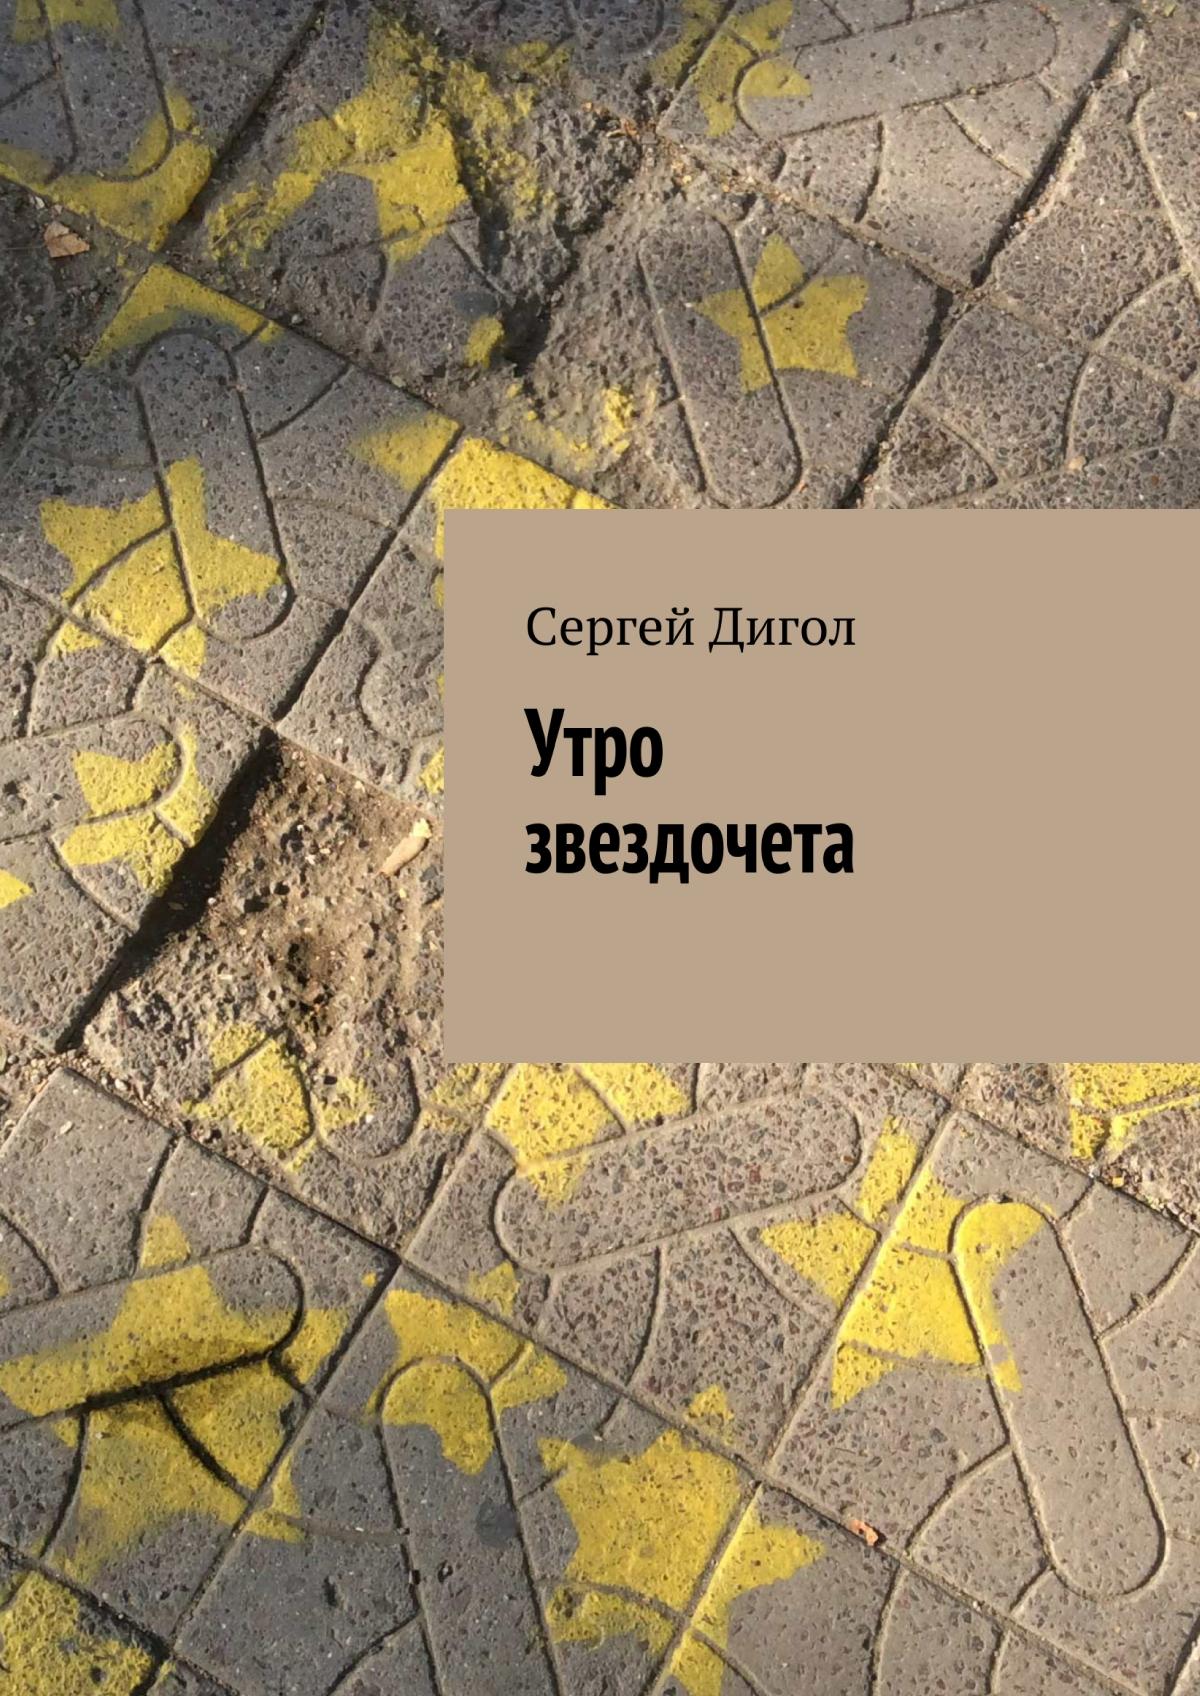 цена на Сергей Дигол Утро звездочета